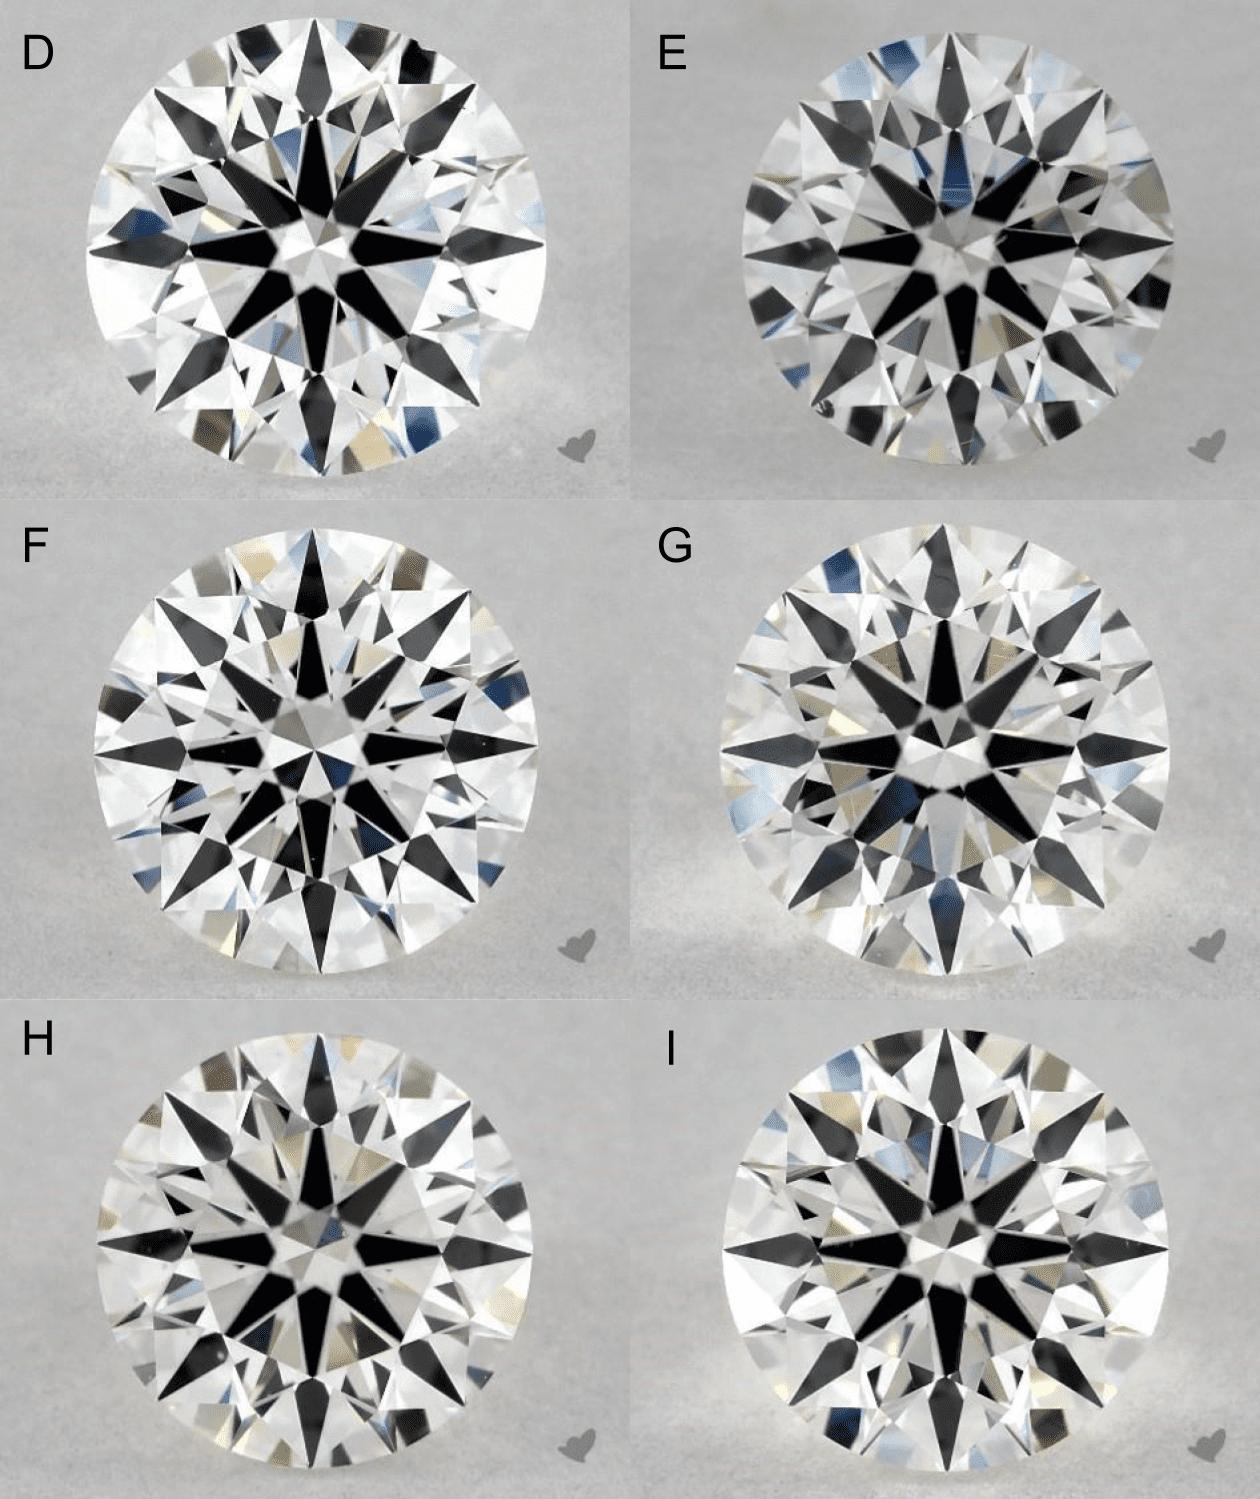 diamond fluorescence - diamond colors with grades